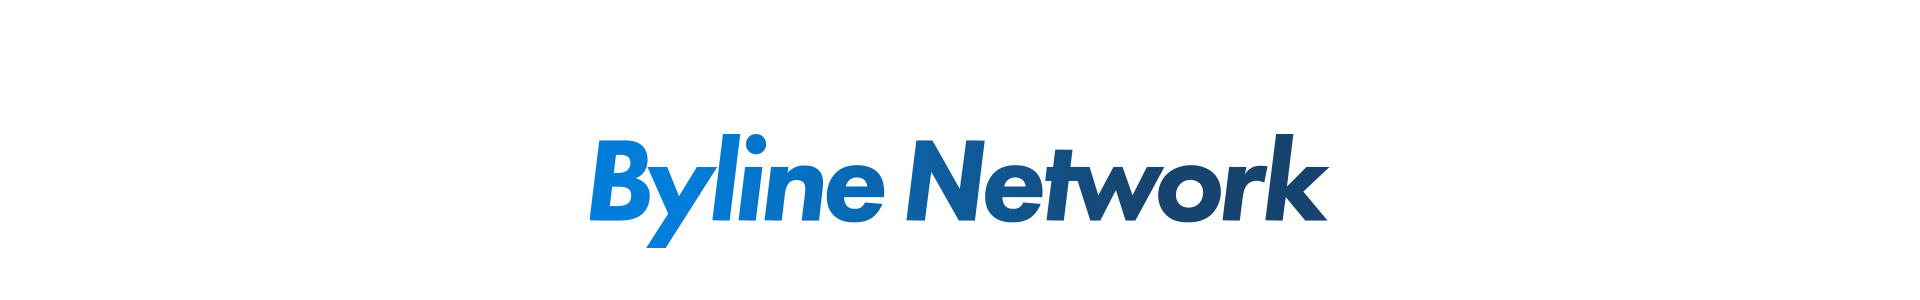 Byline Network